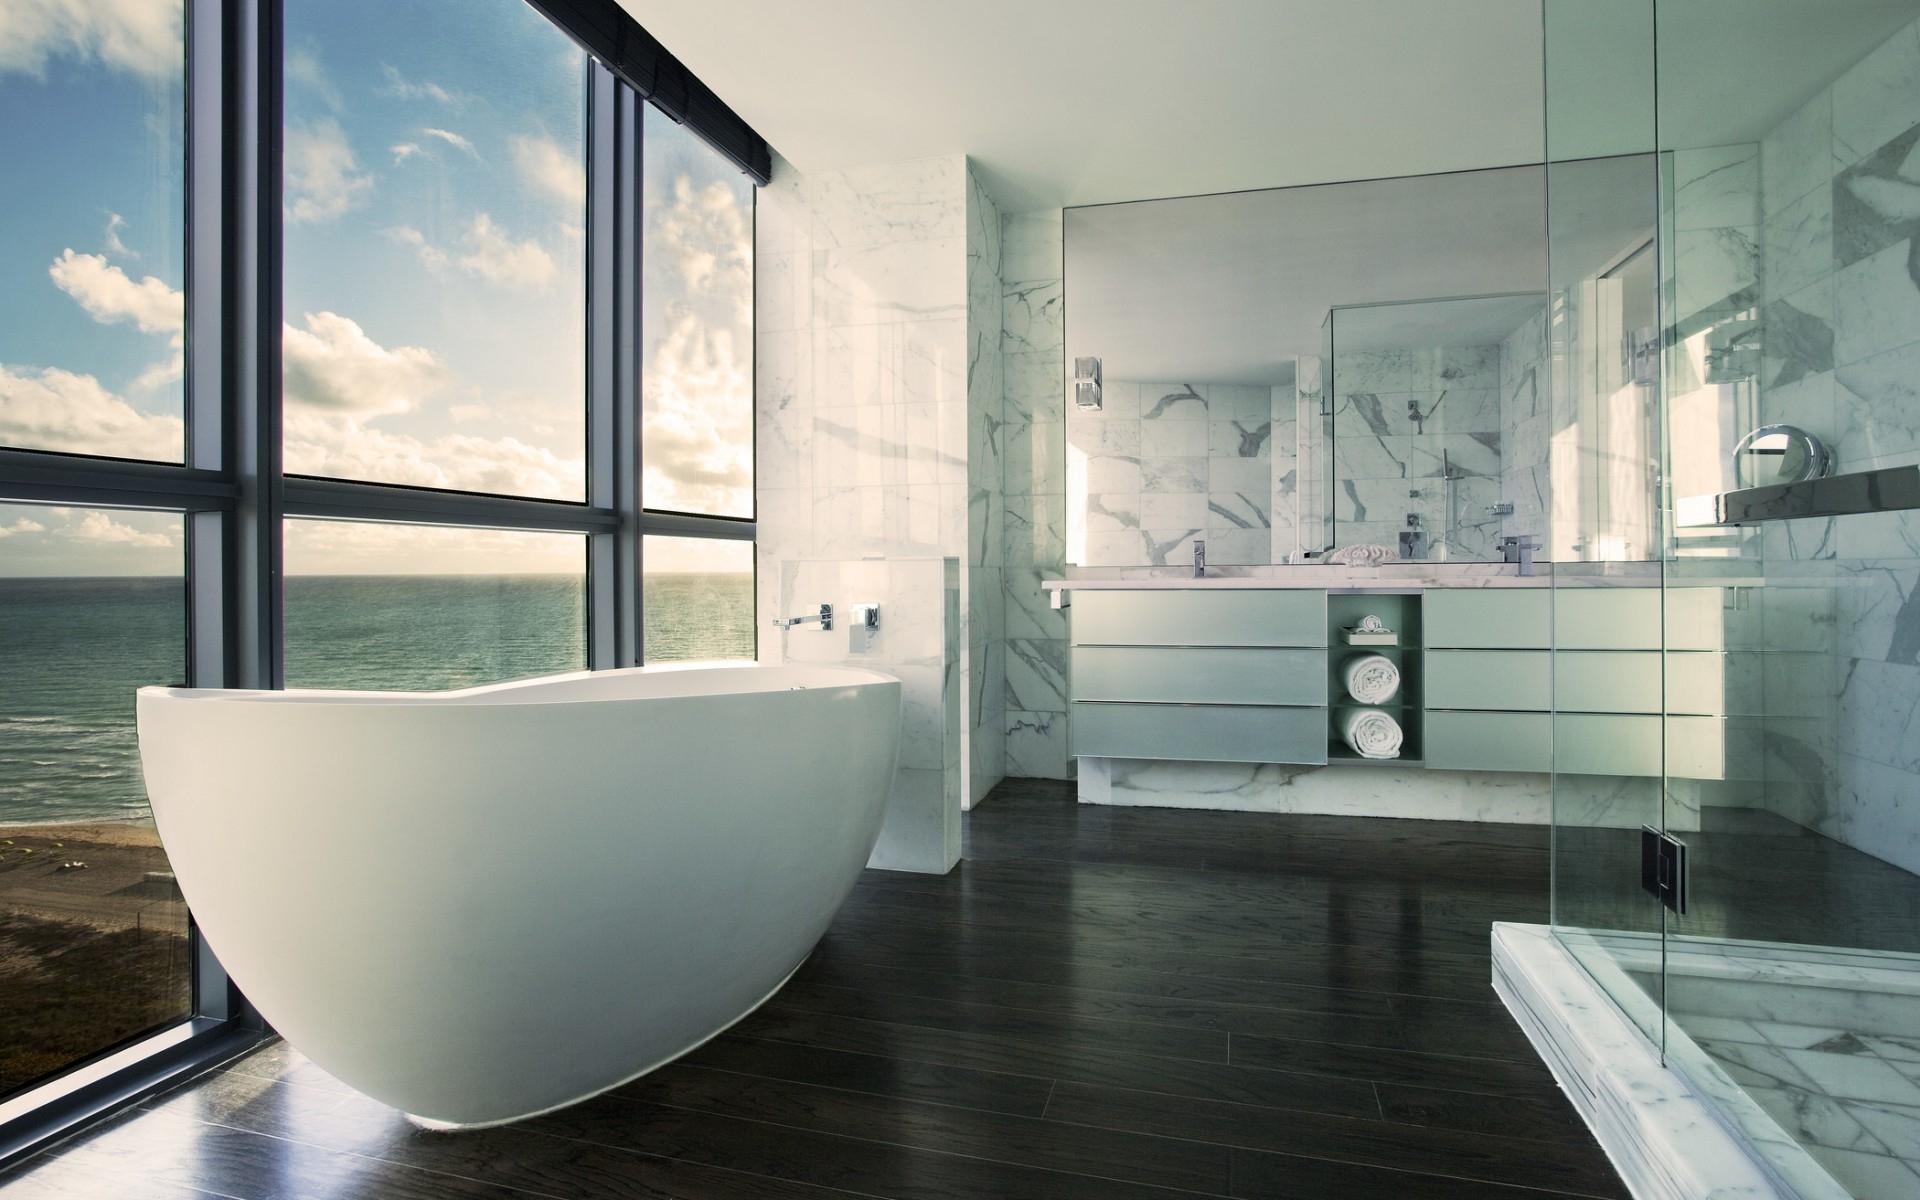 Modern Bathroom Hd - HD Wallpaper